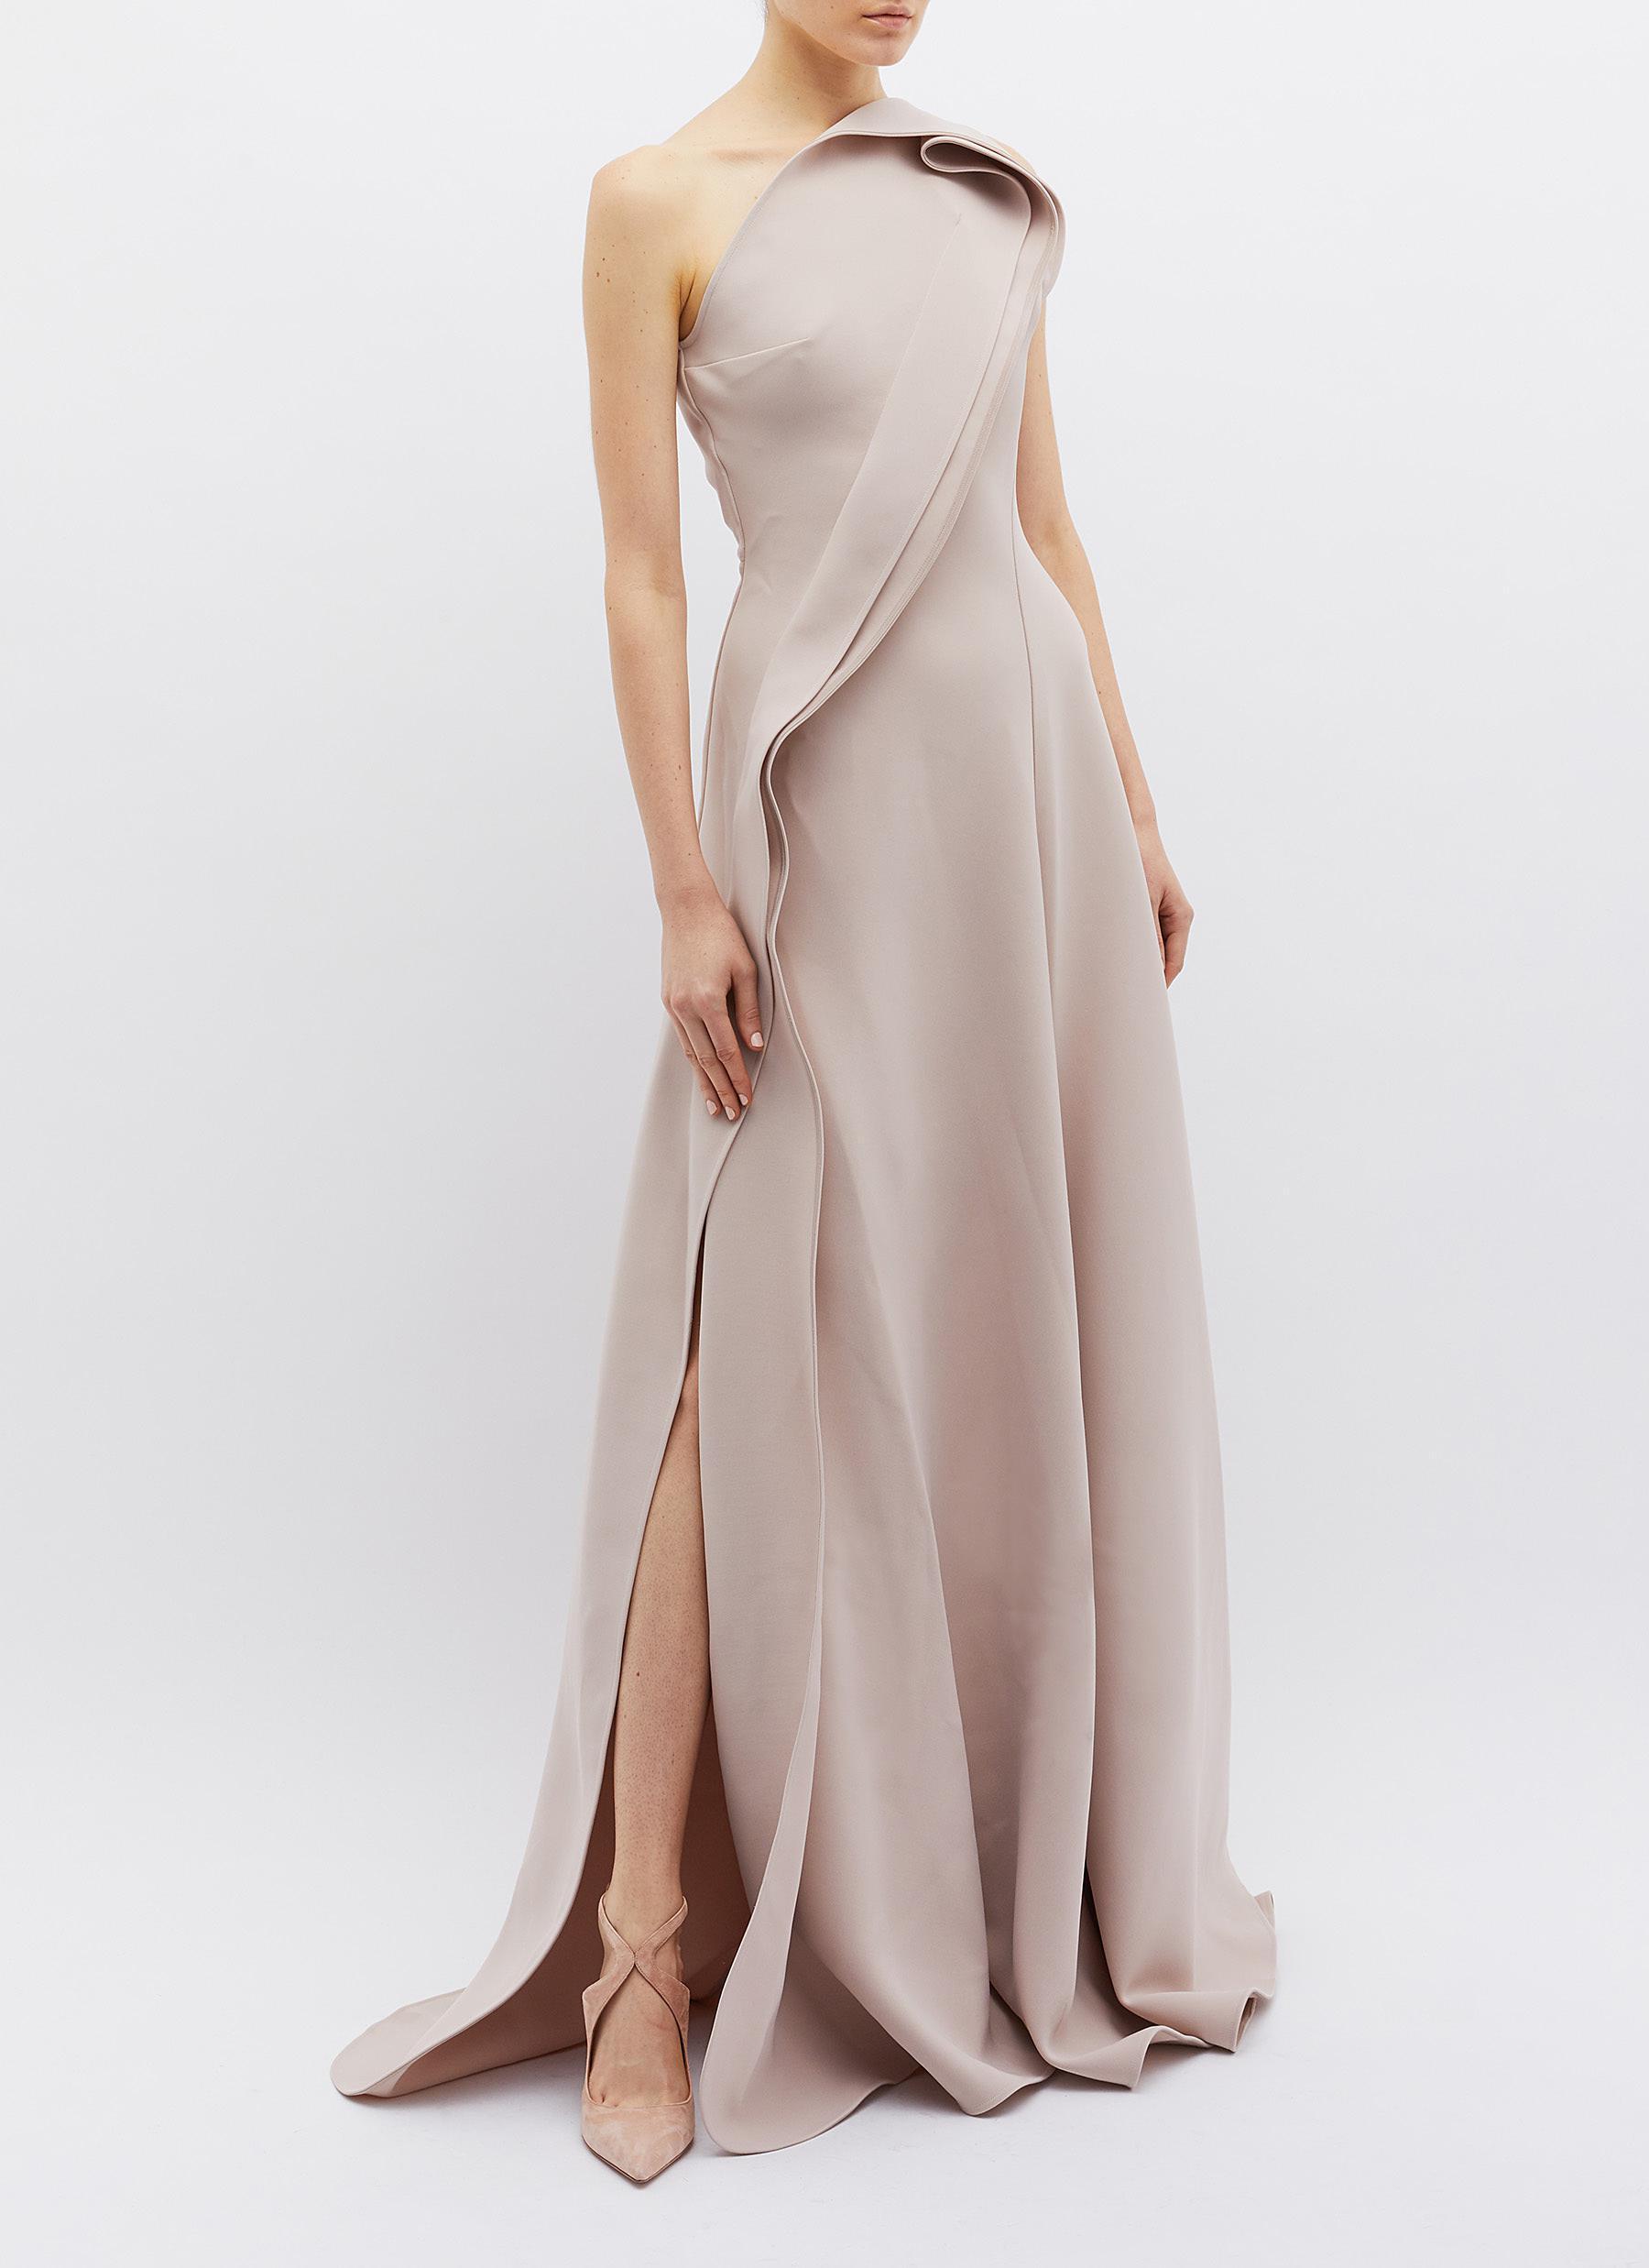 Amorous Pics amorous gown